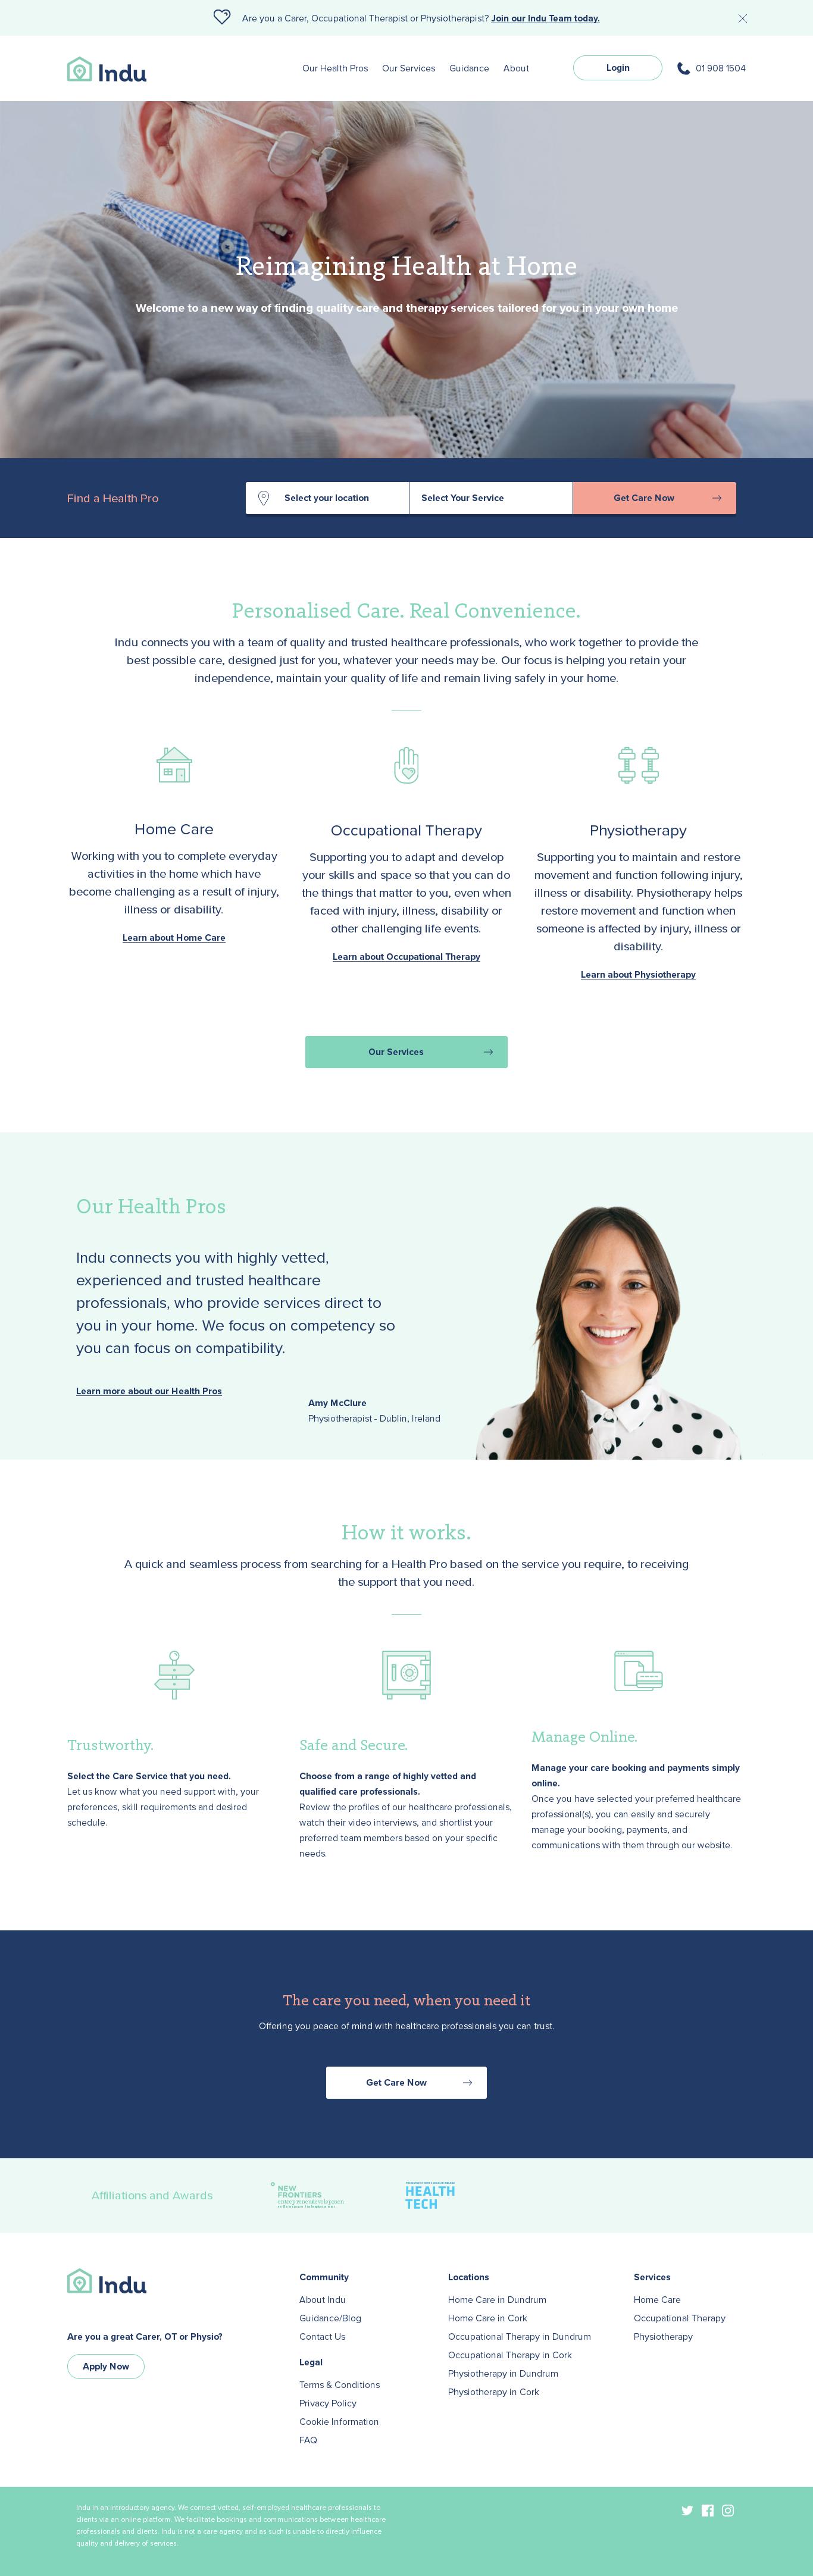 What A Nice Website Design From Land Book Com With Images Website Inspiration Cool Websites Website Design